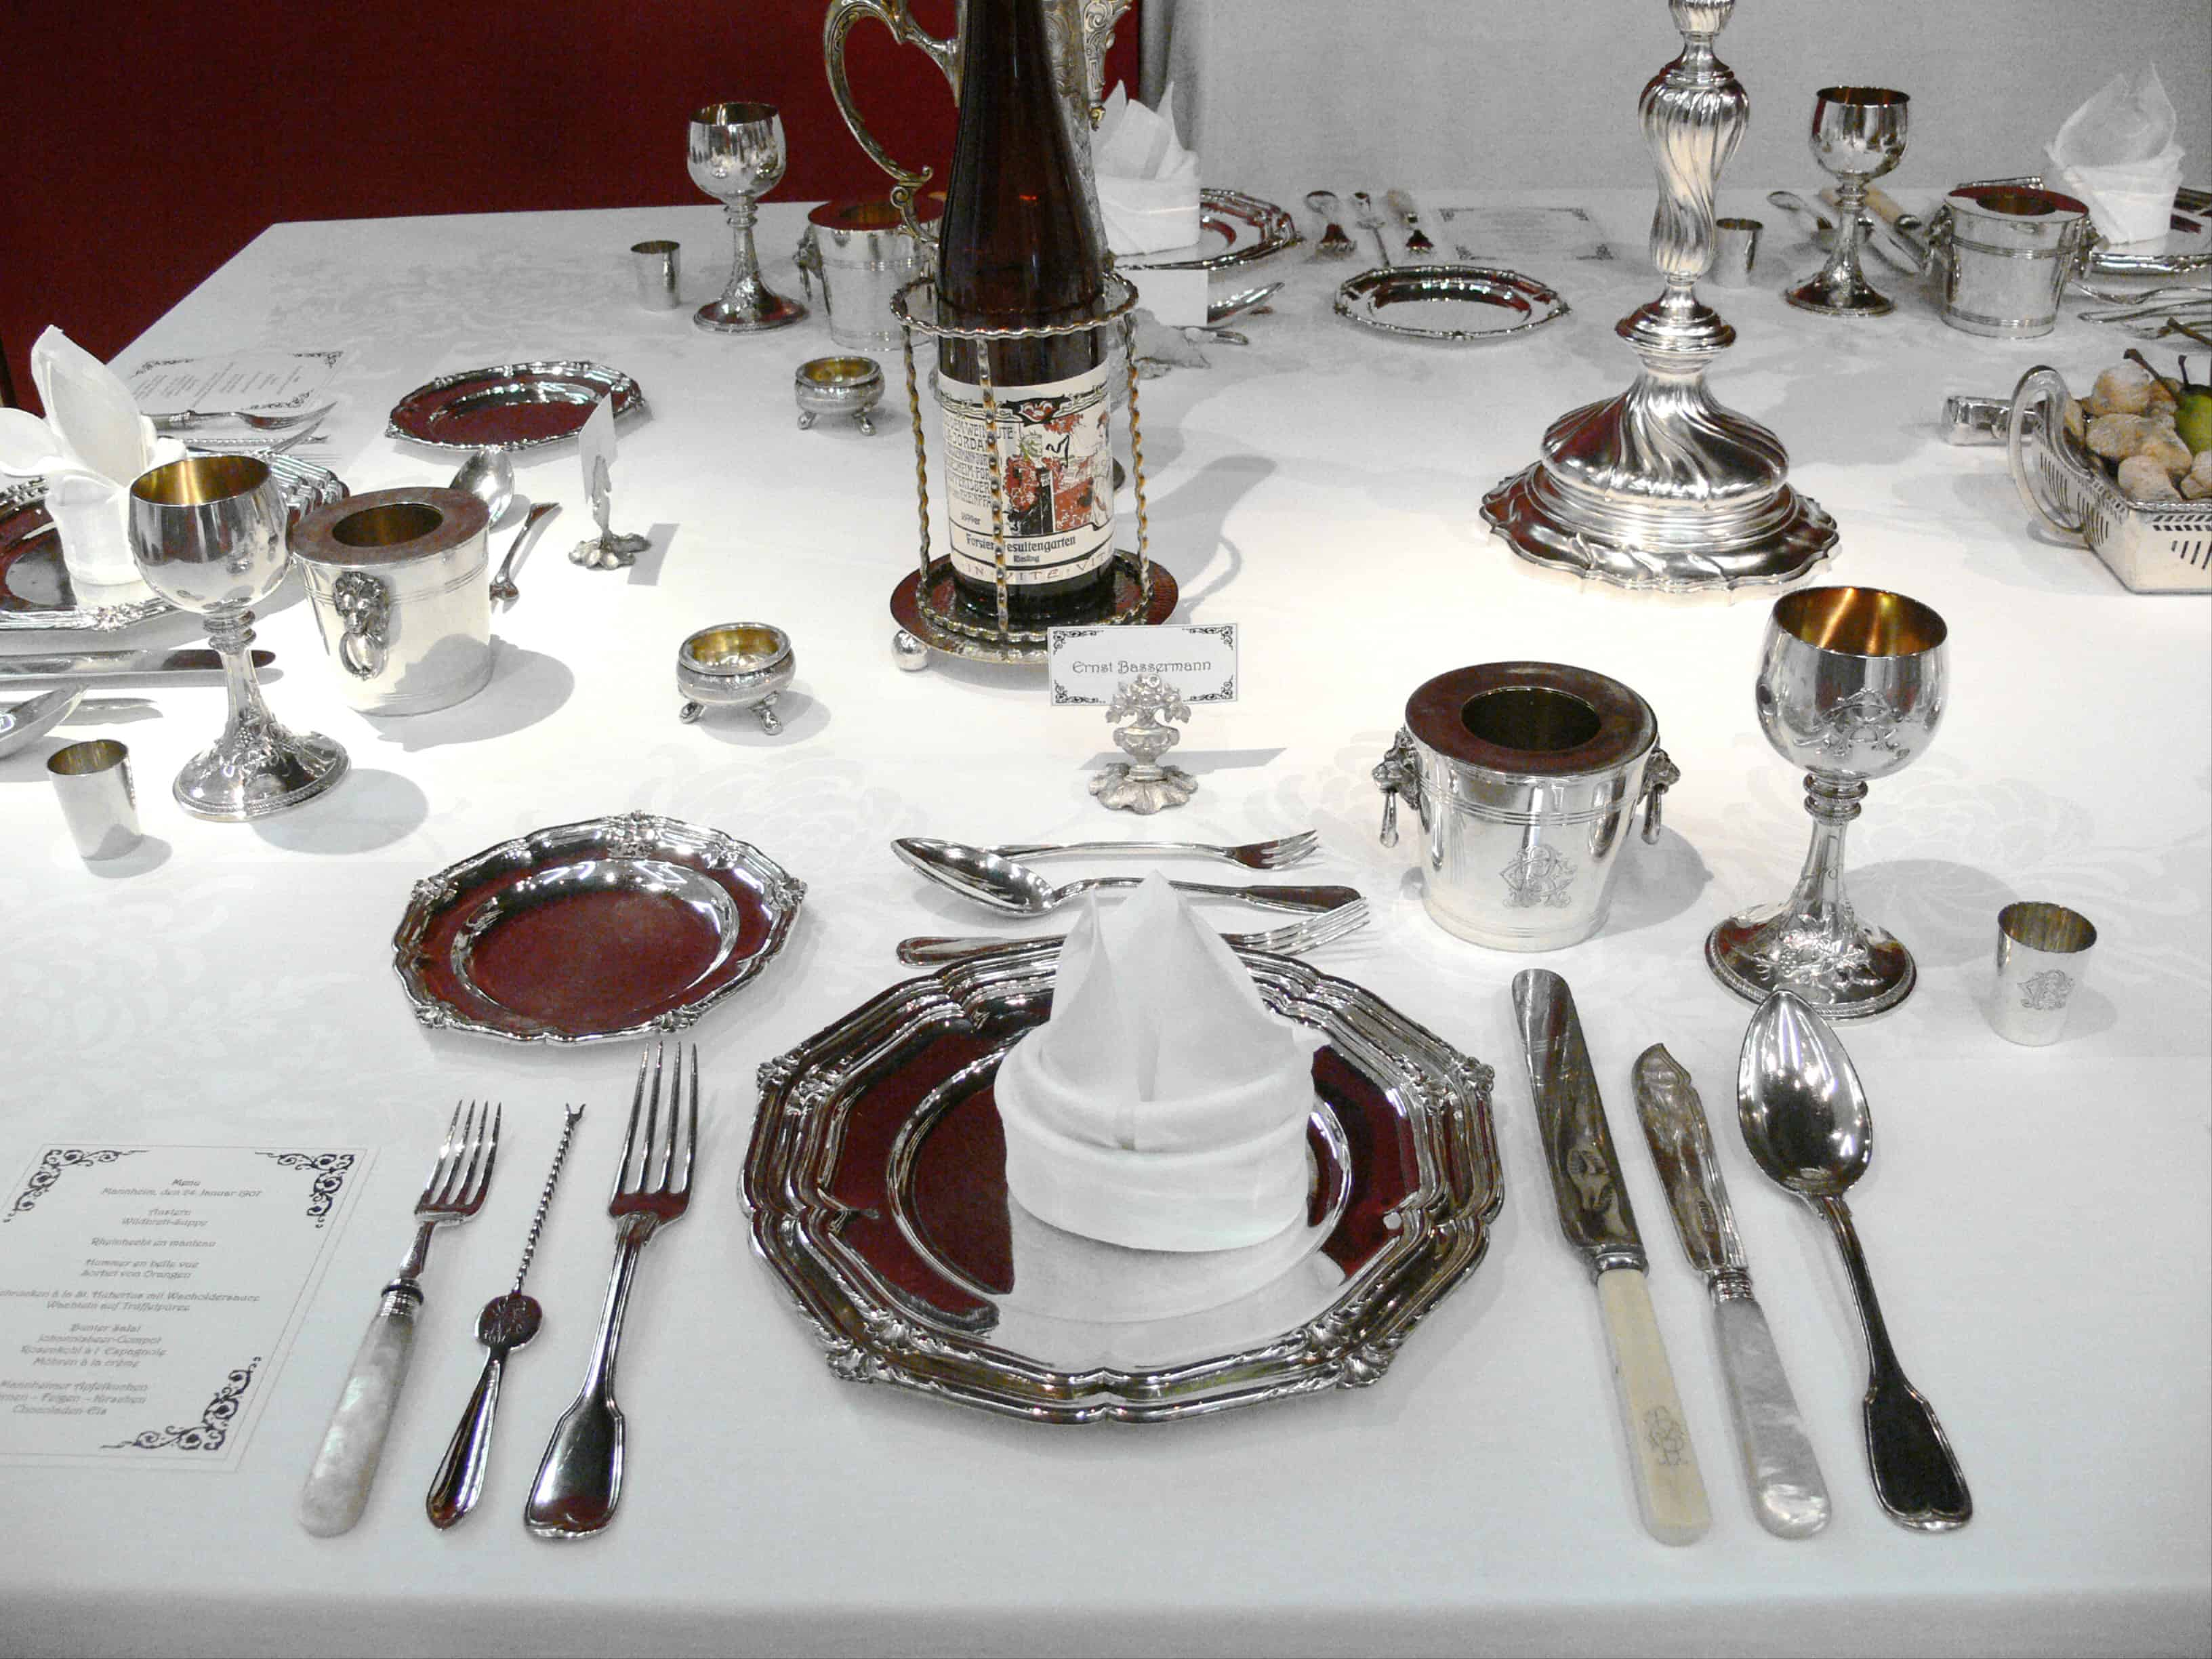 Breakfast Table Setting ~ Rules of civility dinner etiquette formal dining